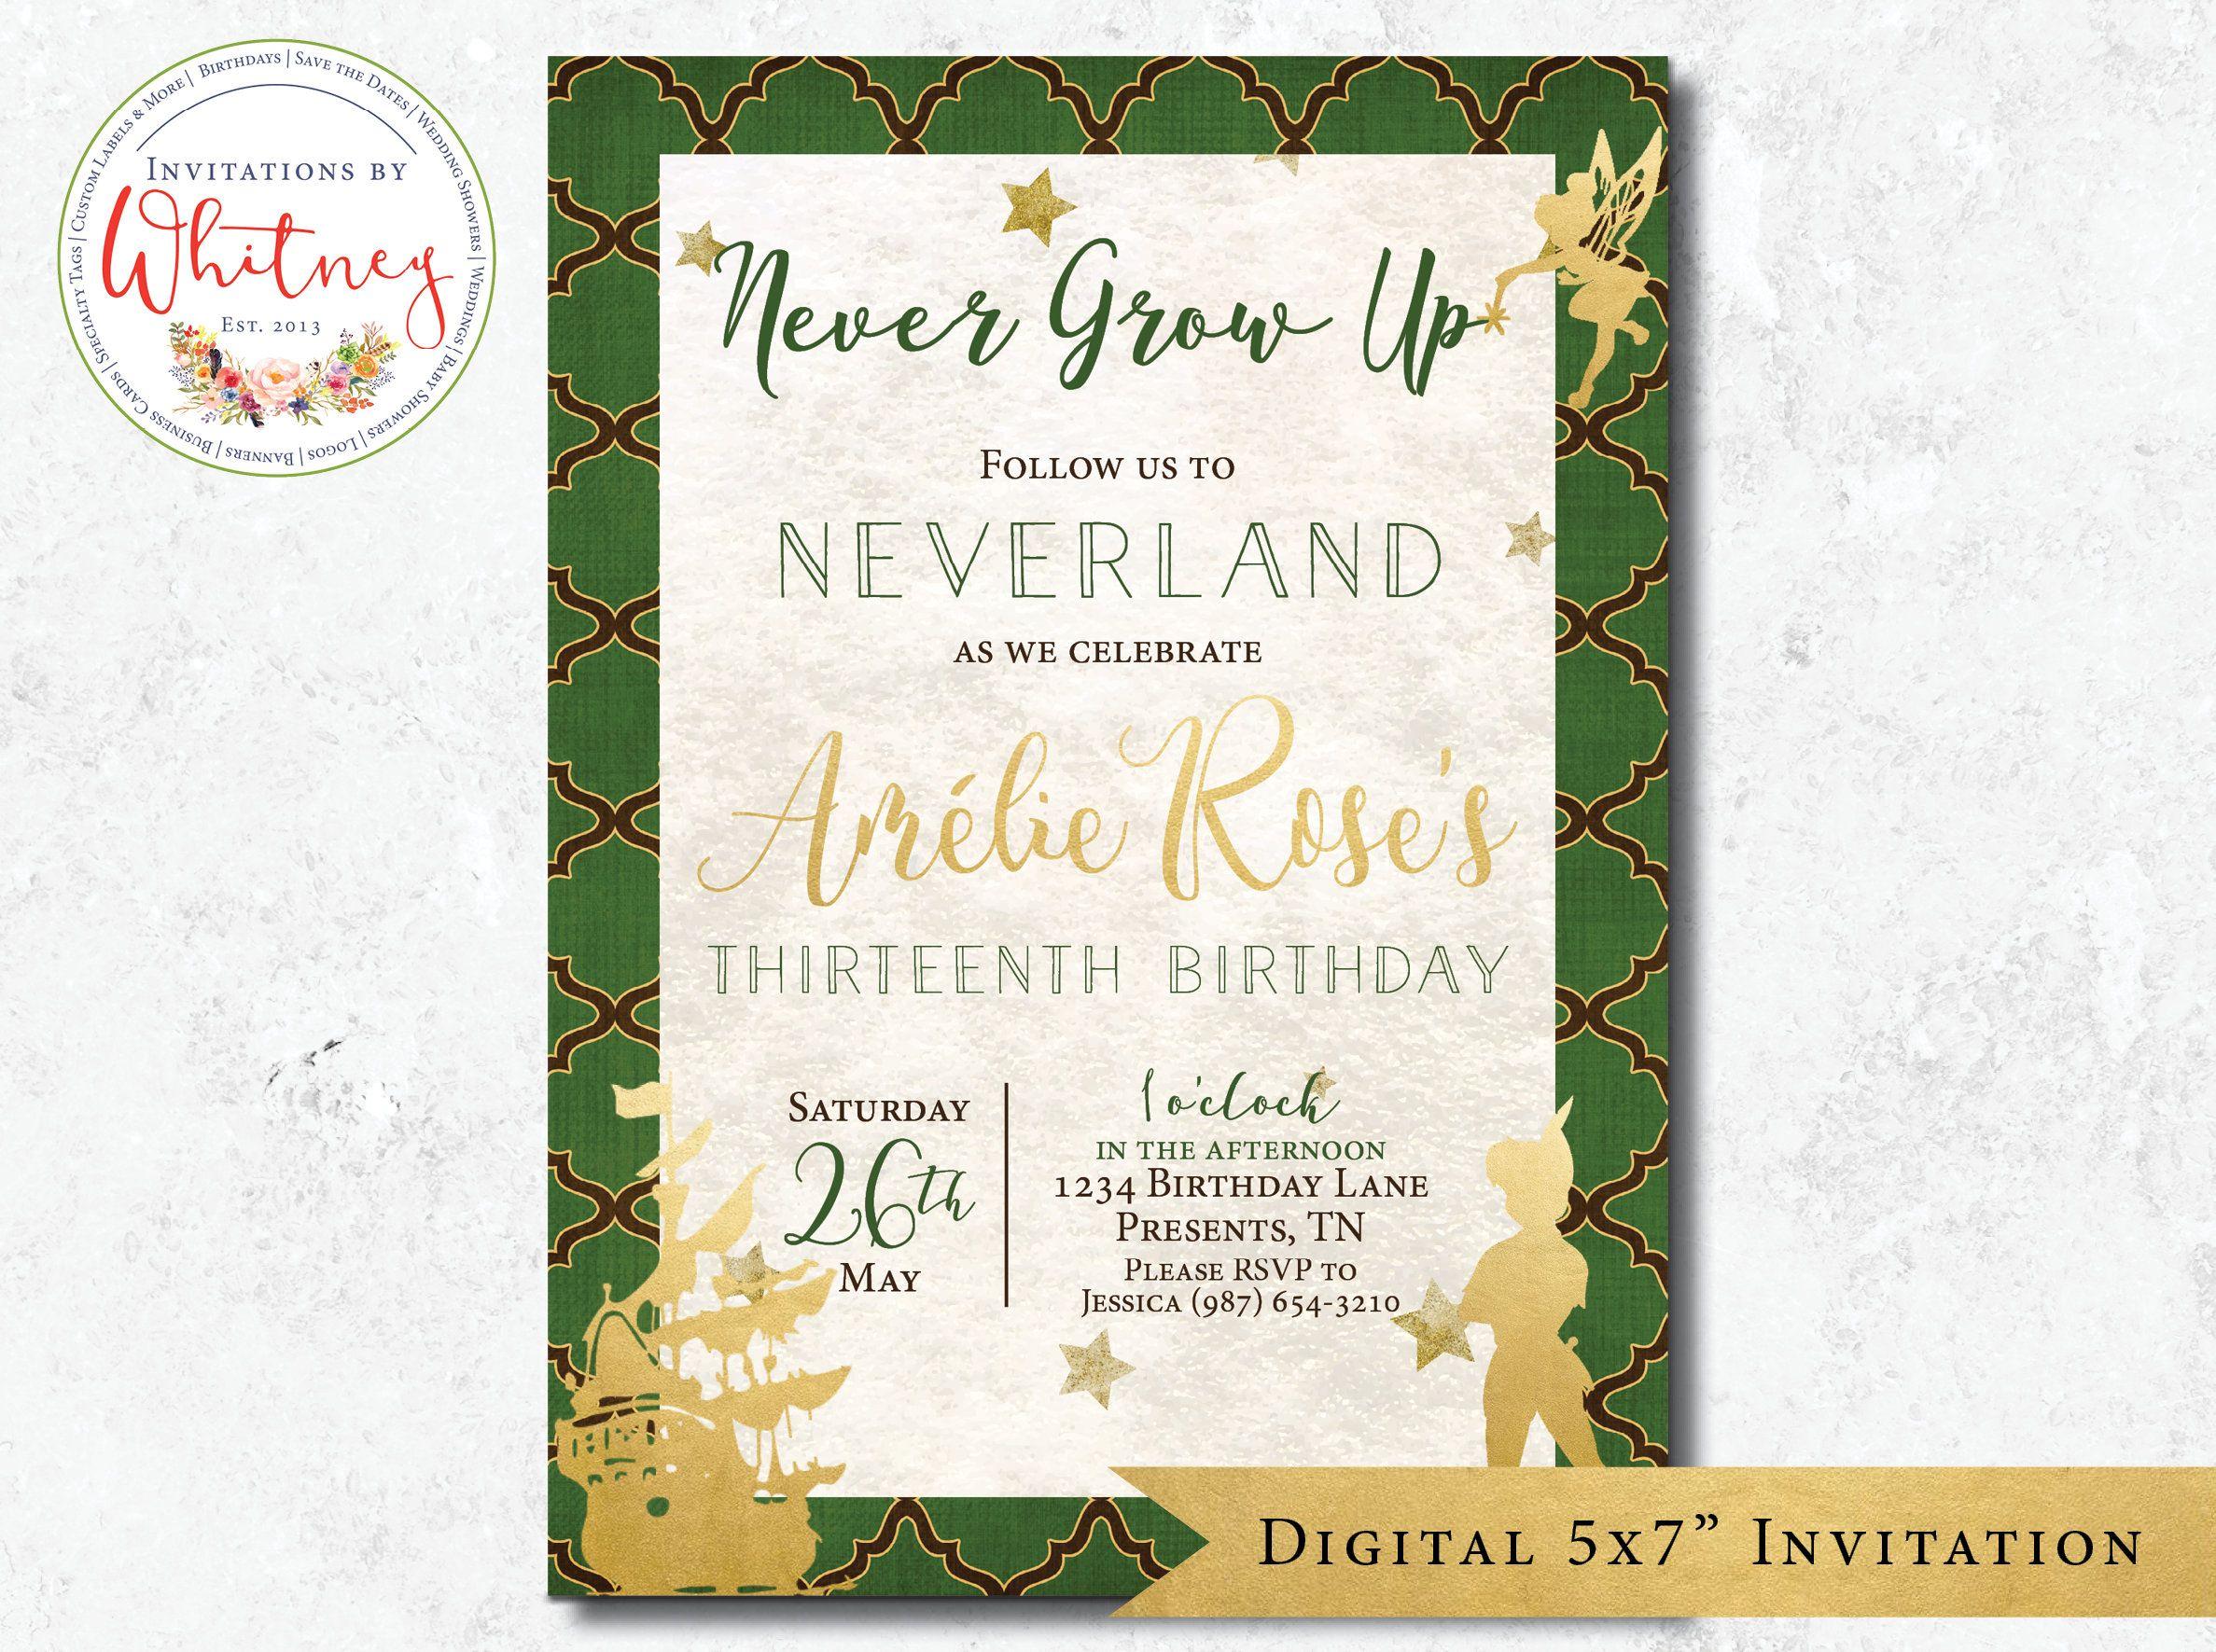 Never Grow Up Invitation Neverland Peter Pan